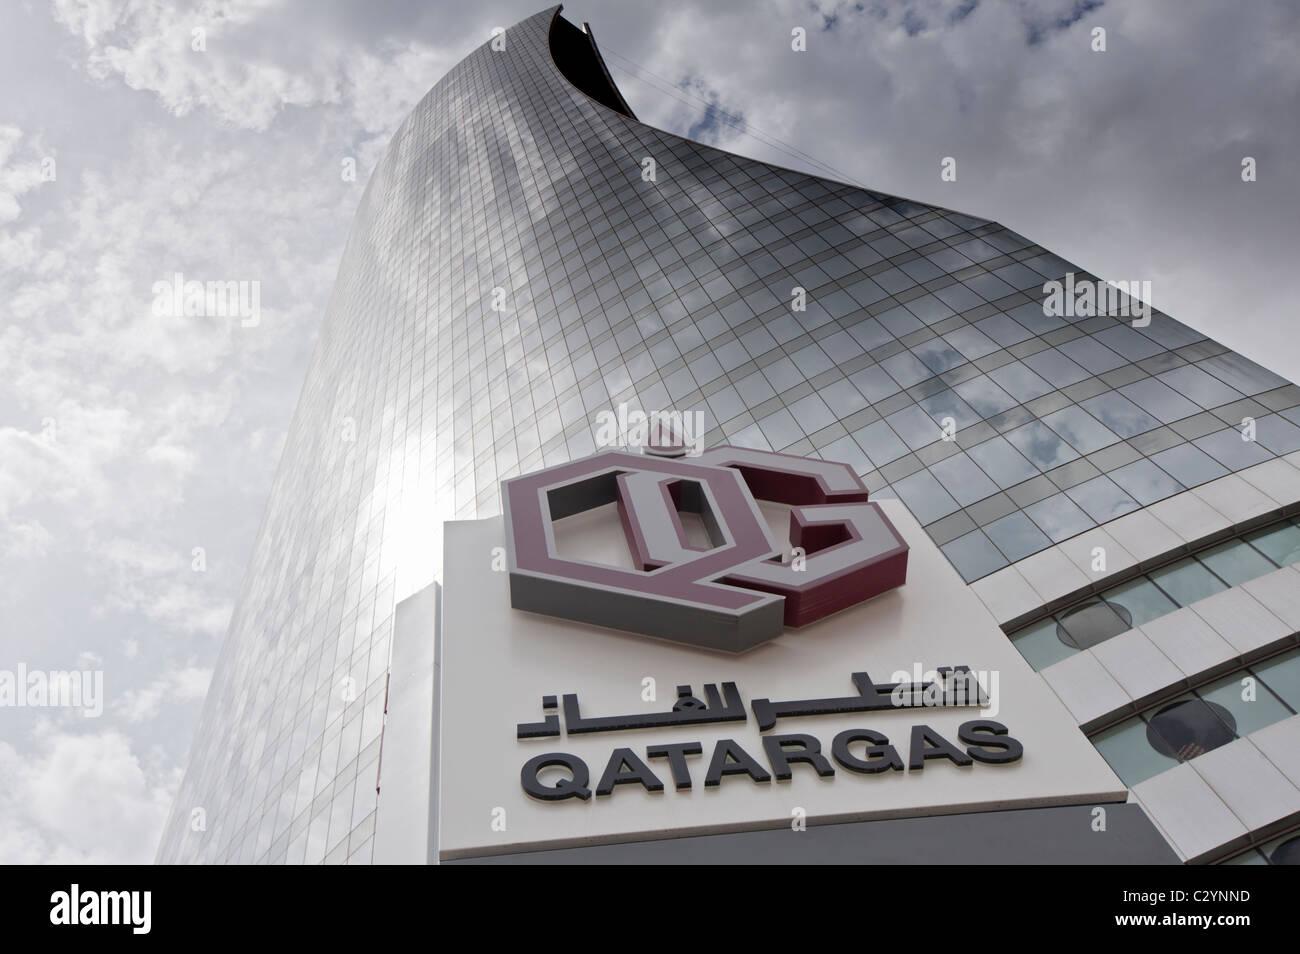 Energy company Qatargas headquarters in Doha Qatar Stock